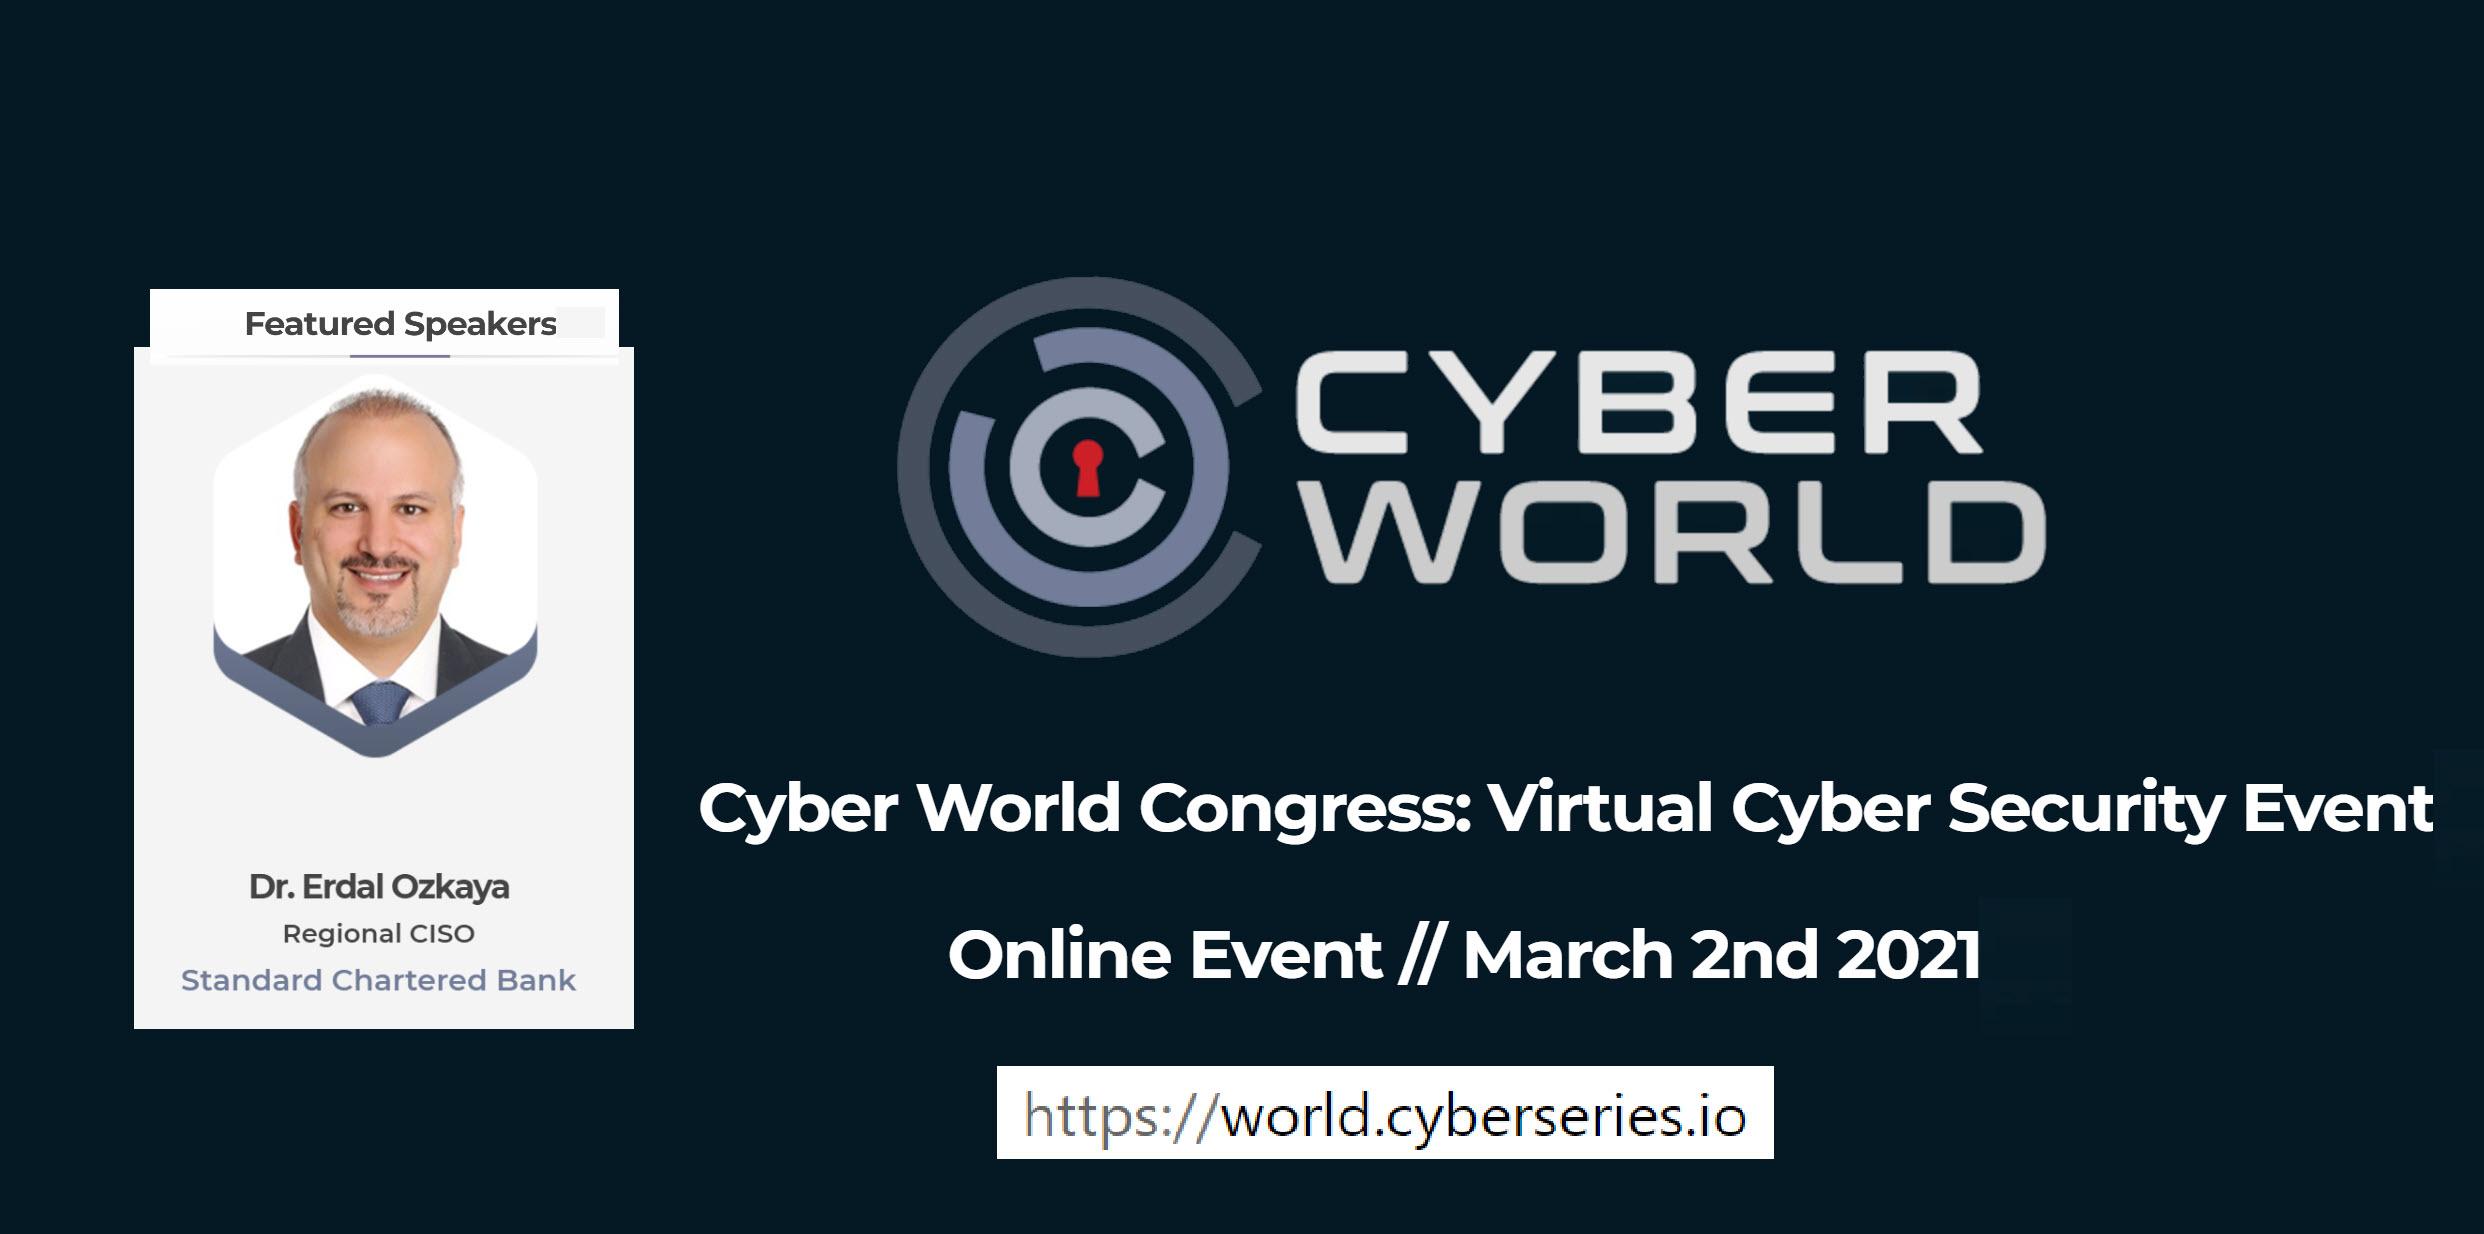 Cyber World Conference Dr Erdal Ozkaya